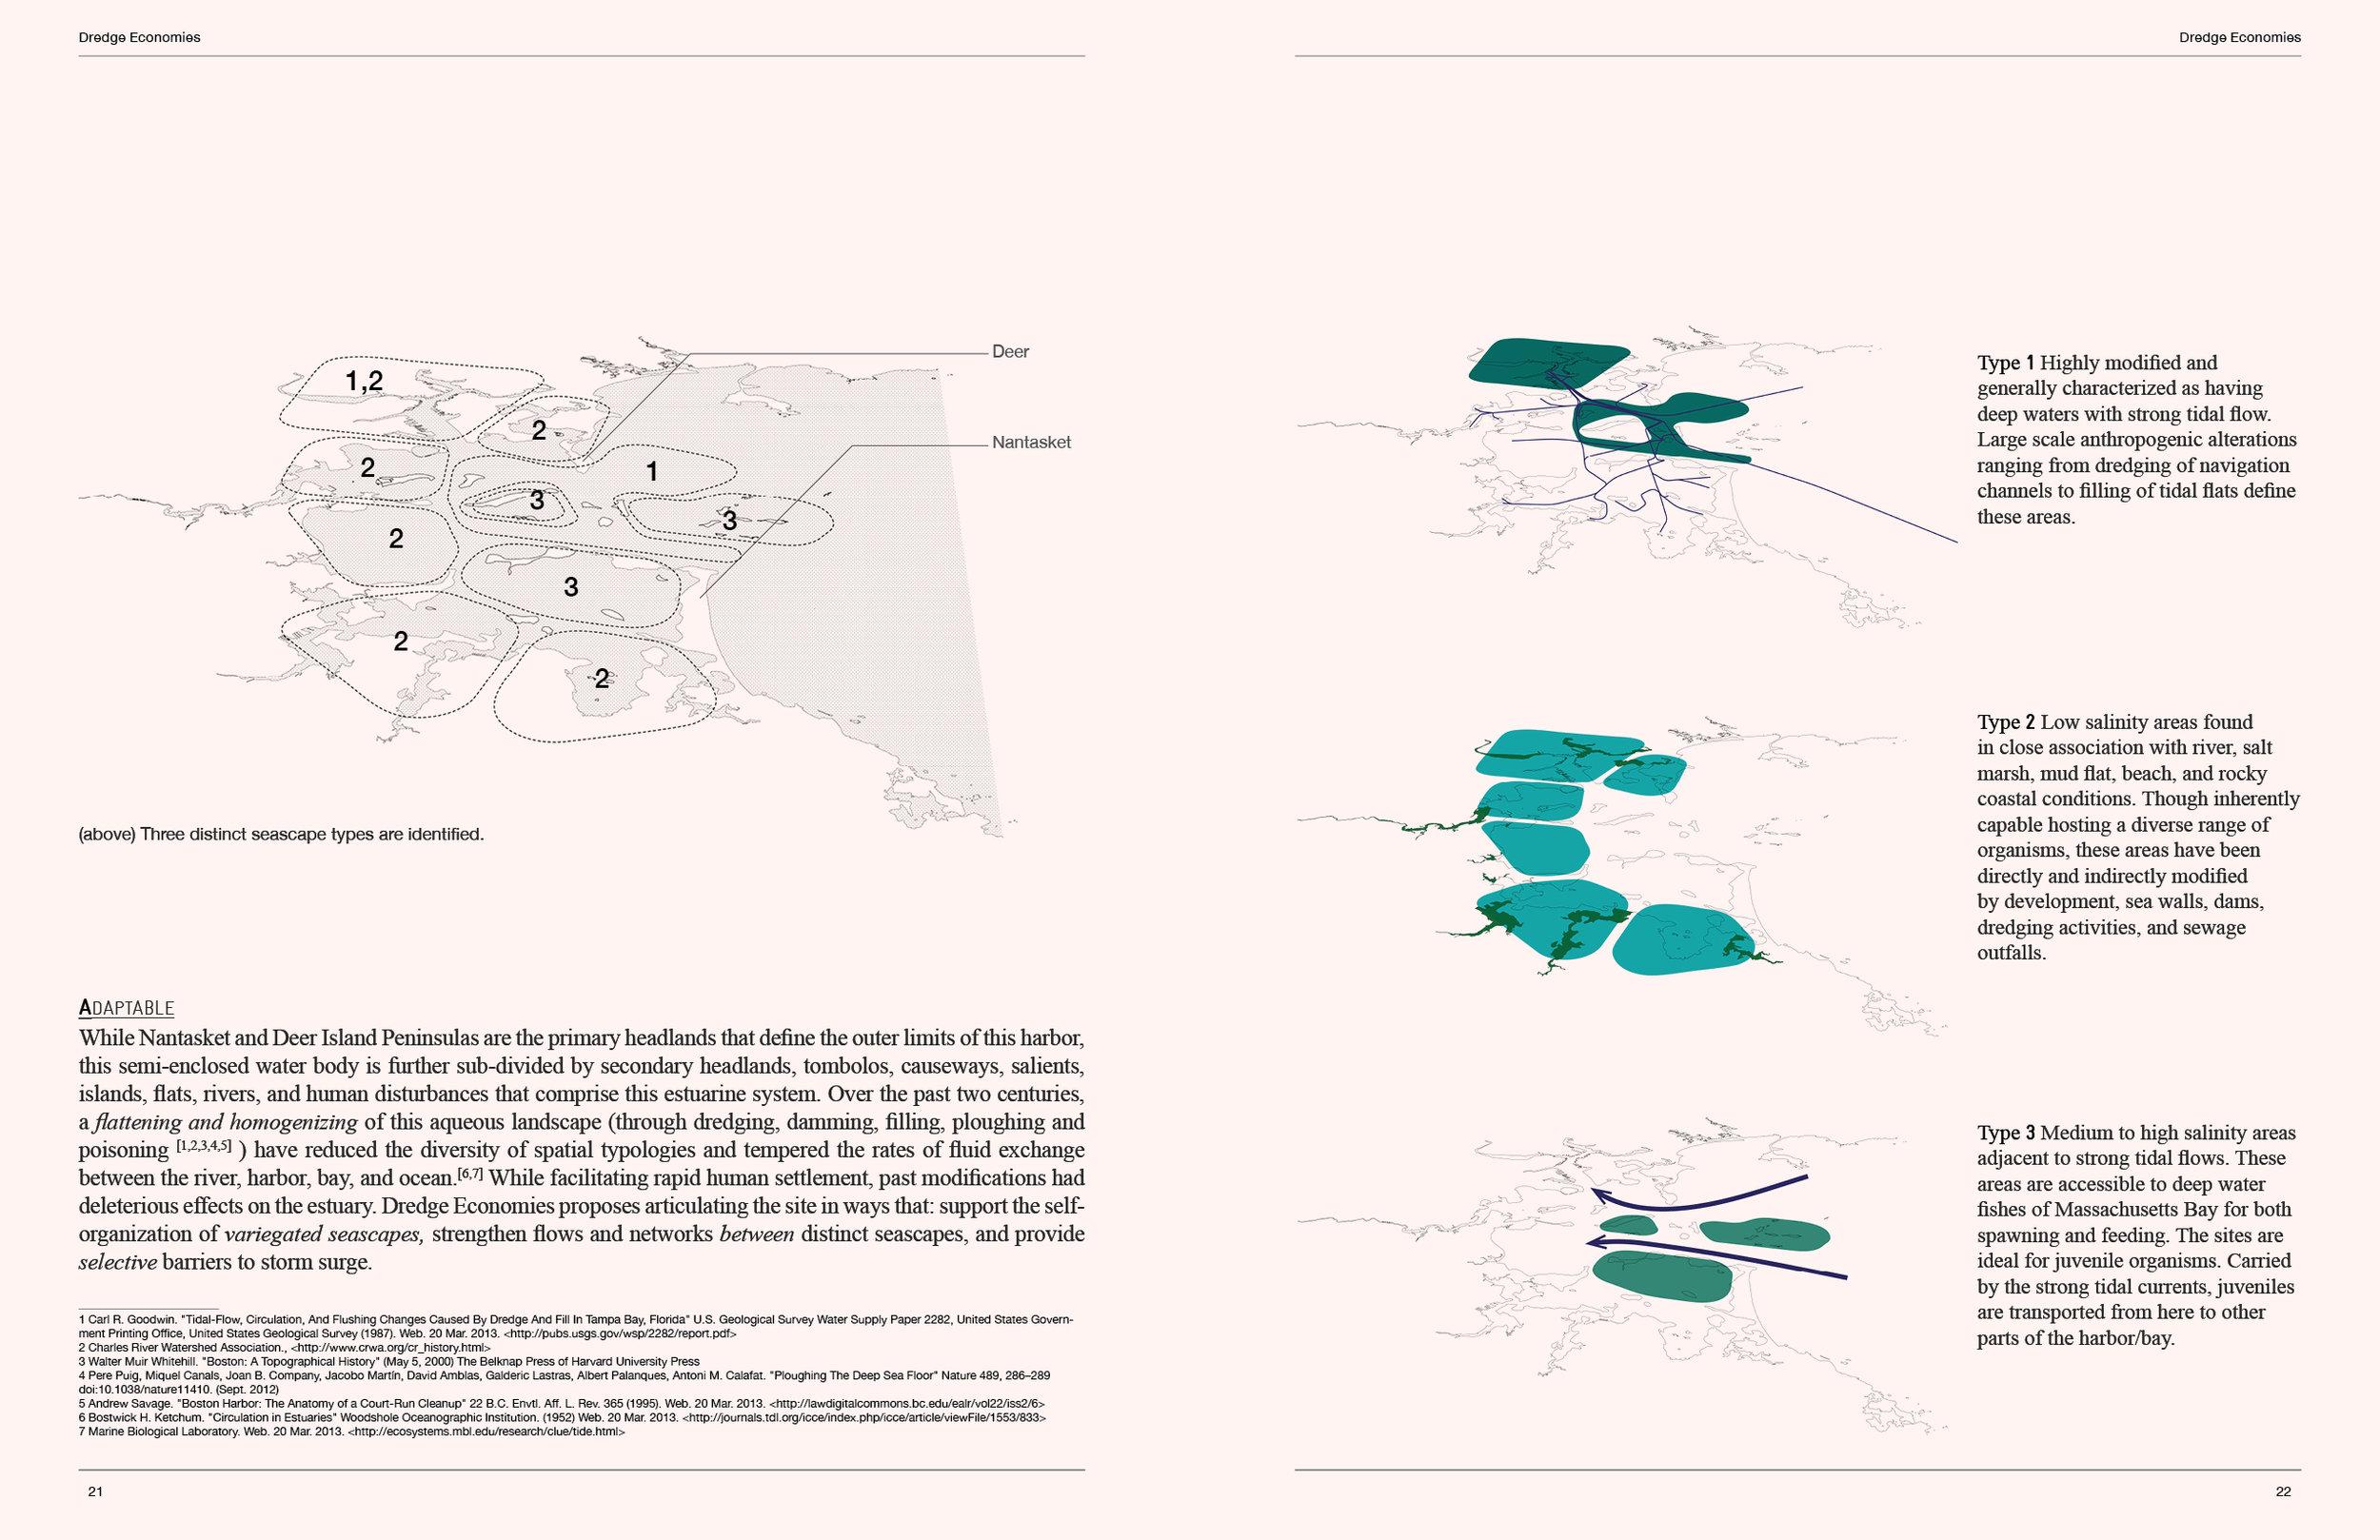 Dredge Economies Chapter 1_pg511.jpg